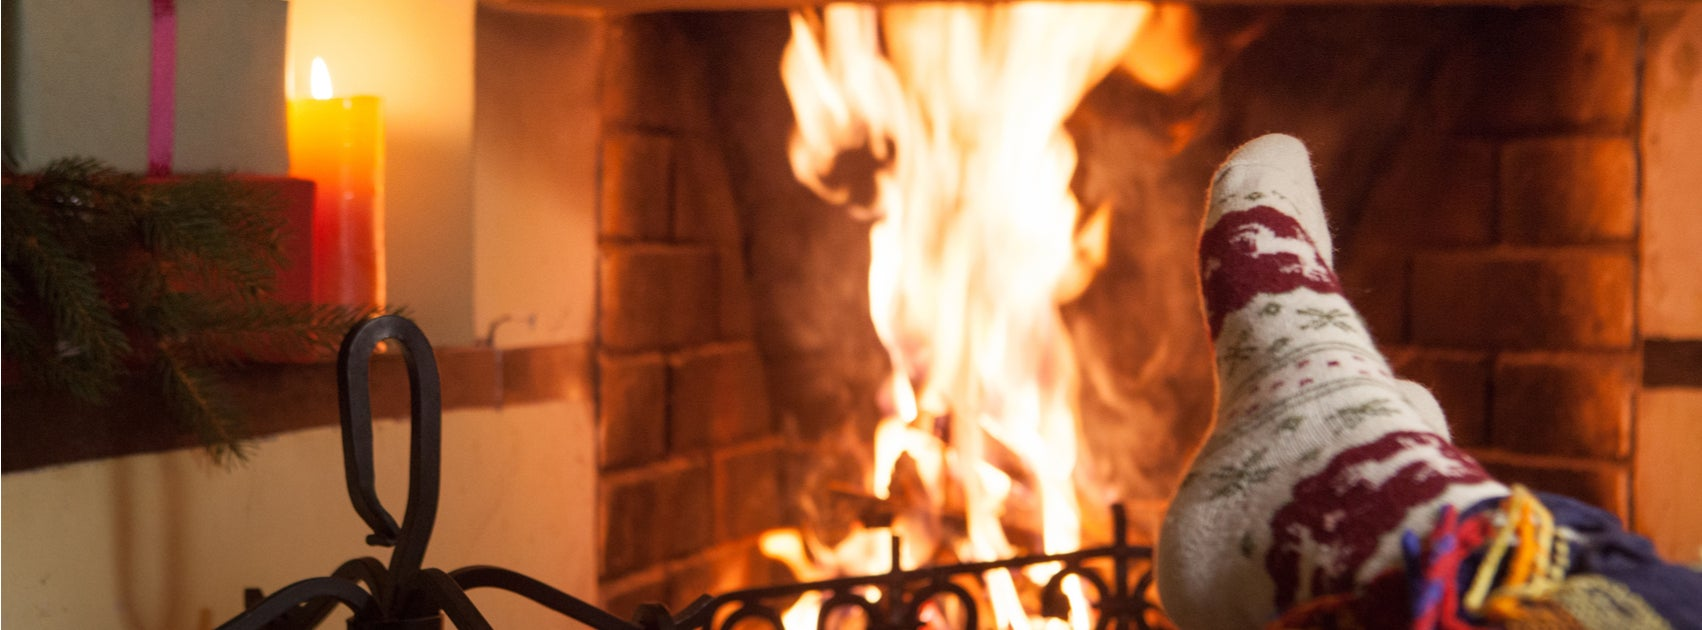 Ideas para elegir la chimenea perfecta